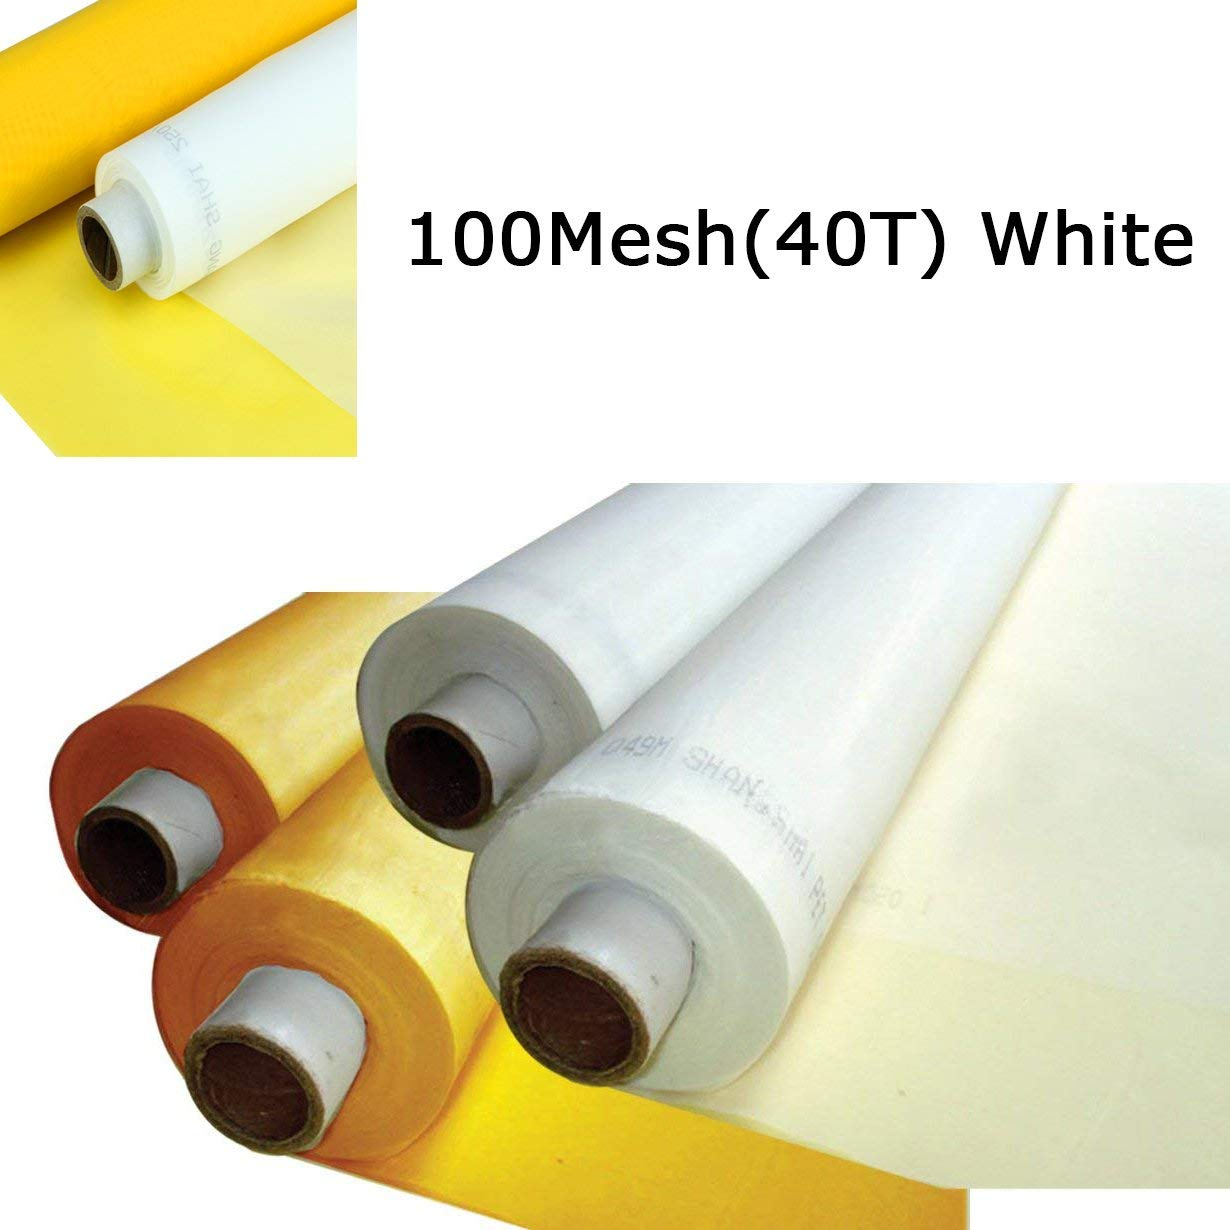 Silk Screen Printing Fabric Mesh 3 Yards 1.27 Meters Screen Printing Mesh Wide High Tension Mesh Making Ink Supplies (100 Mesh(40T))